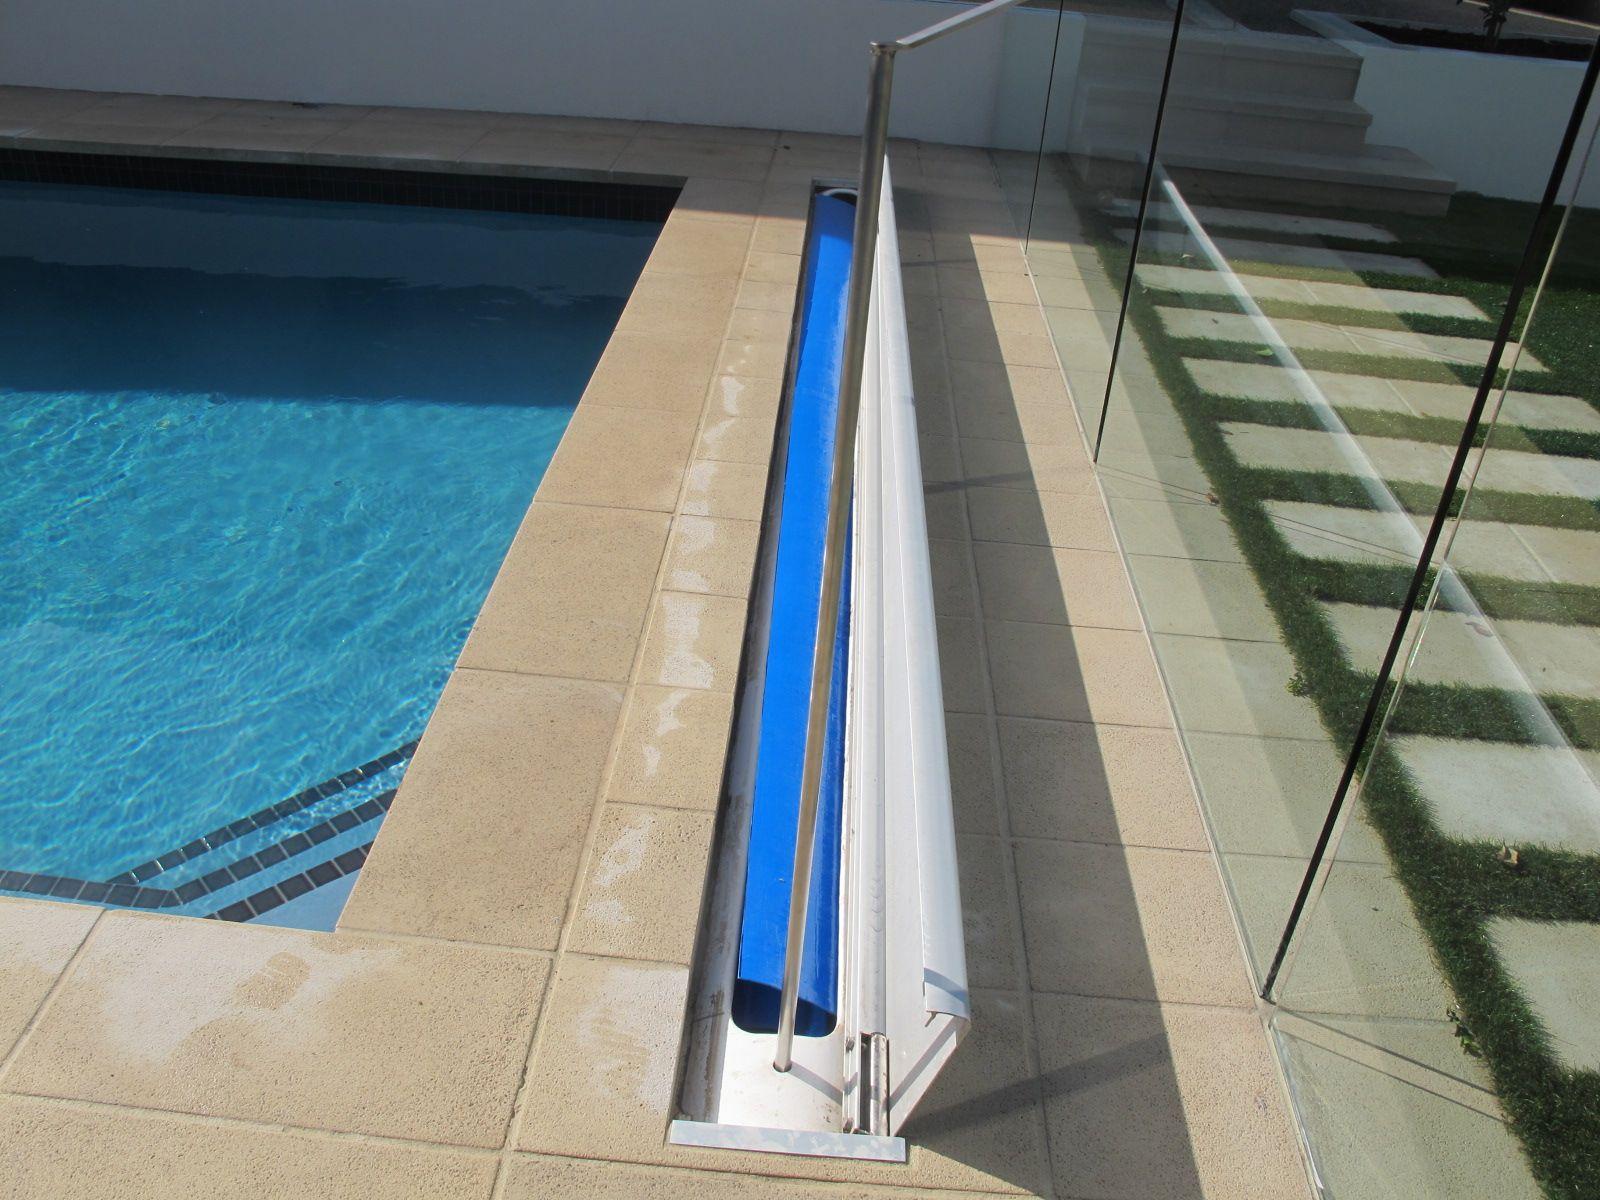 Pin By Binu Samuel On Pool Cover Hidden Pool Pool Cover Roller